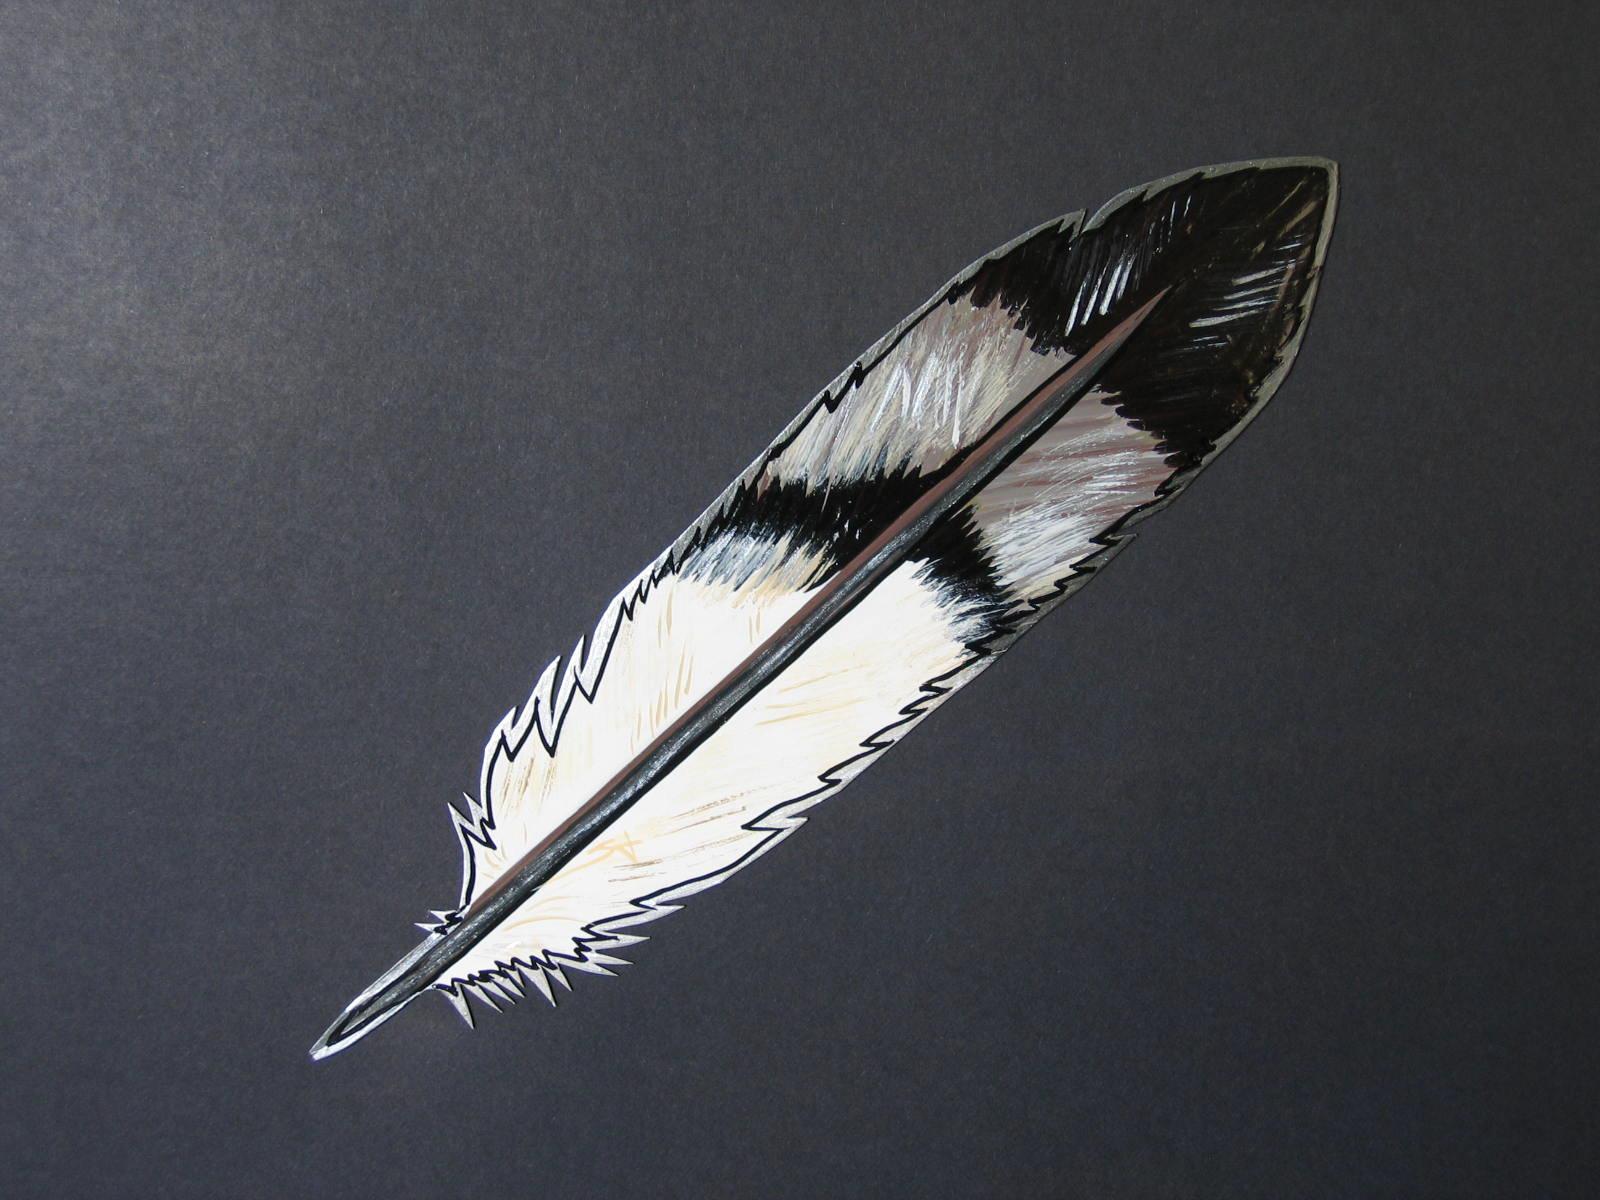 фигуру, перья орла картинки один проход машина